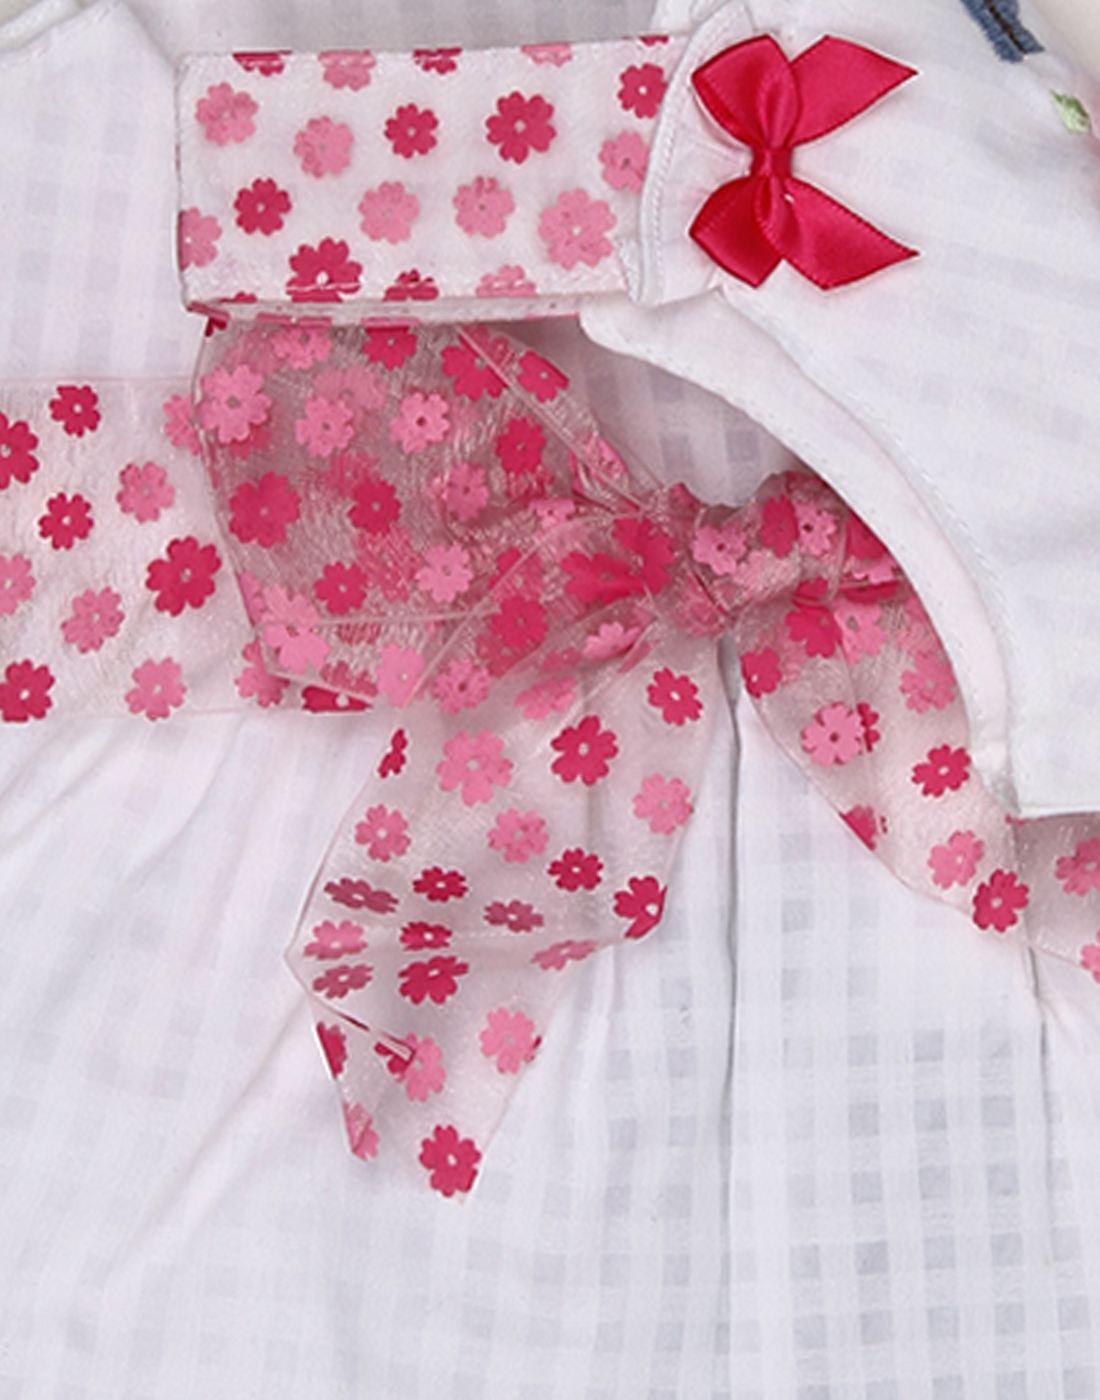 K.C.O 89 Baby Girls Casual Applique Sleeveless Frock